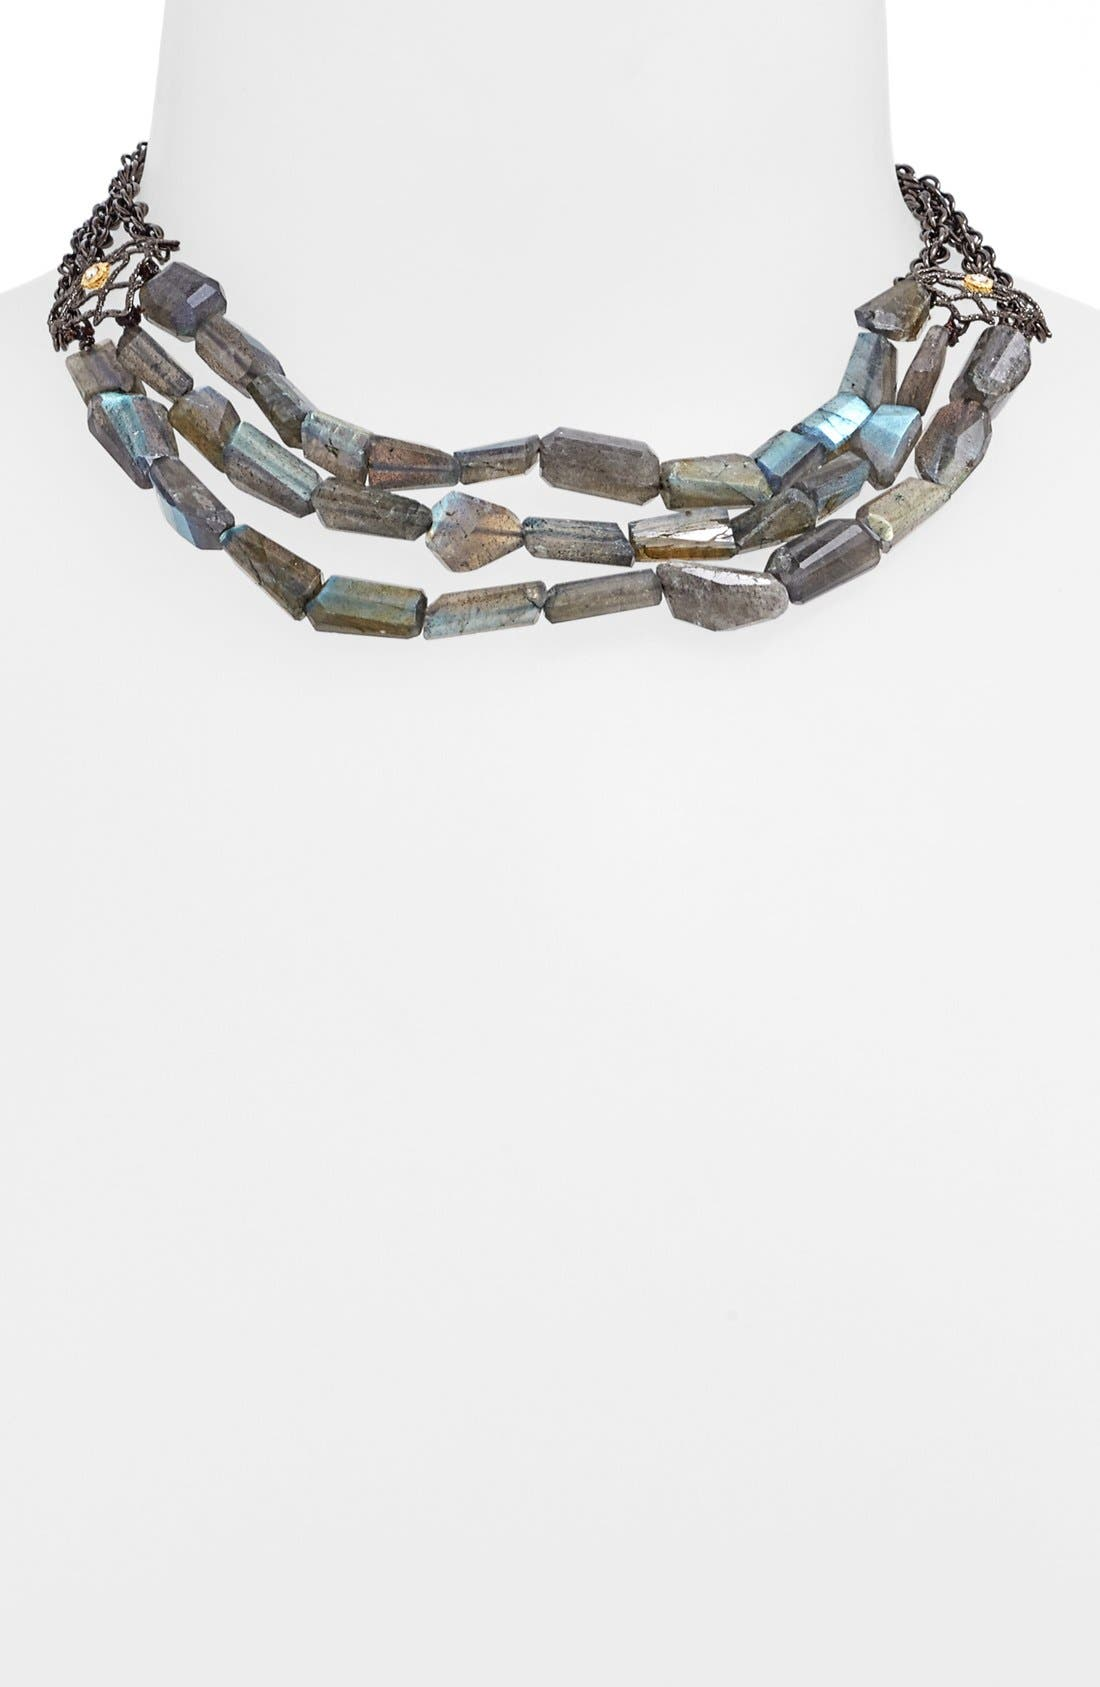 Alternate Image 1 Selected - Alexis Bittar 'Elements - Jardin de Papillon' Frontal Necklace